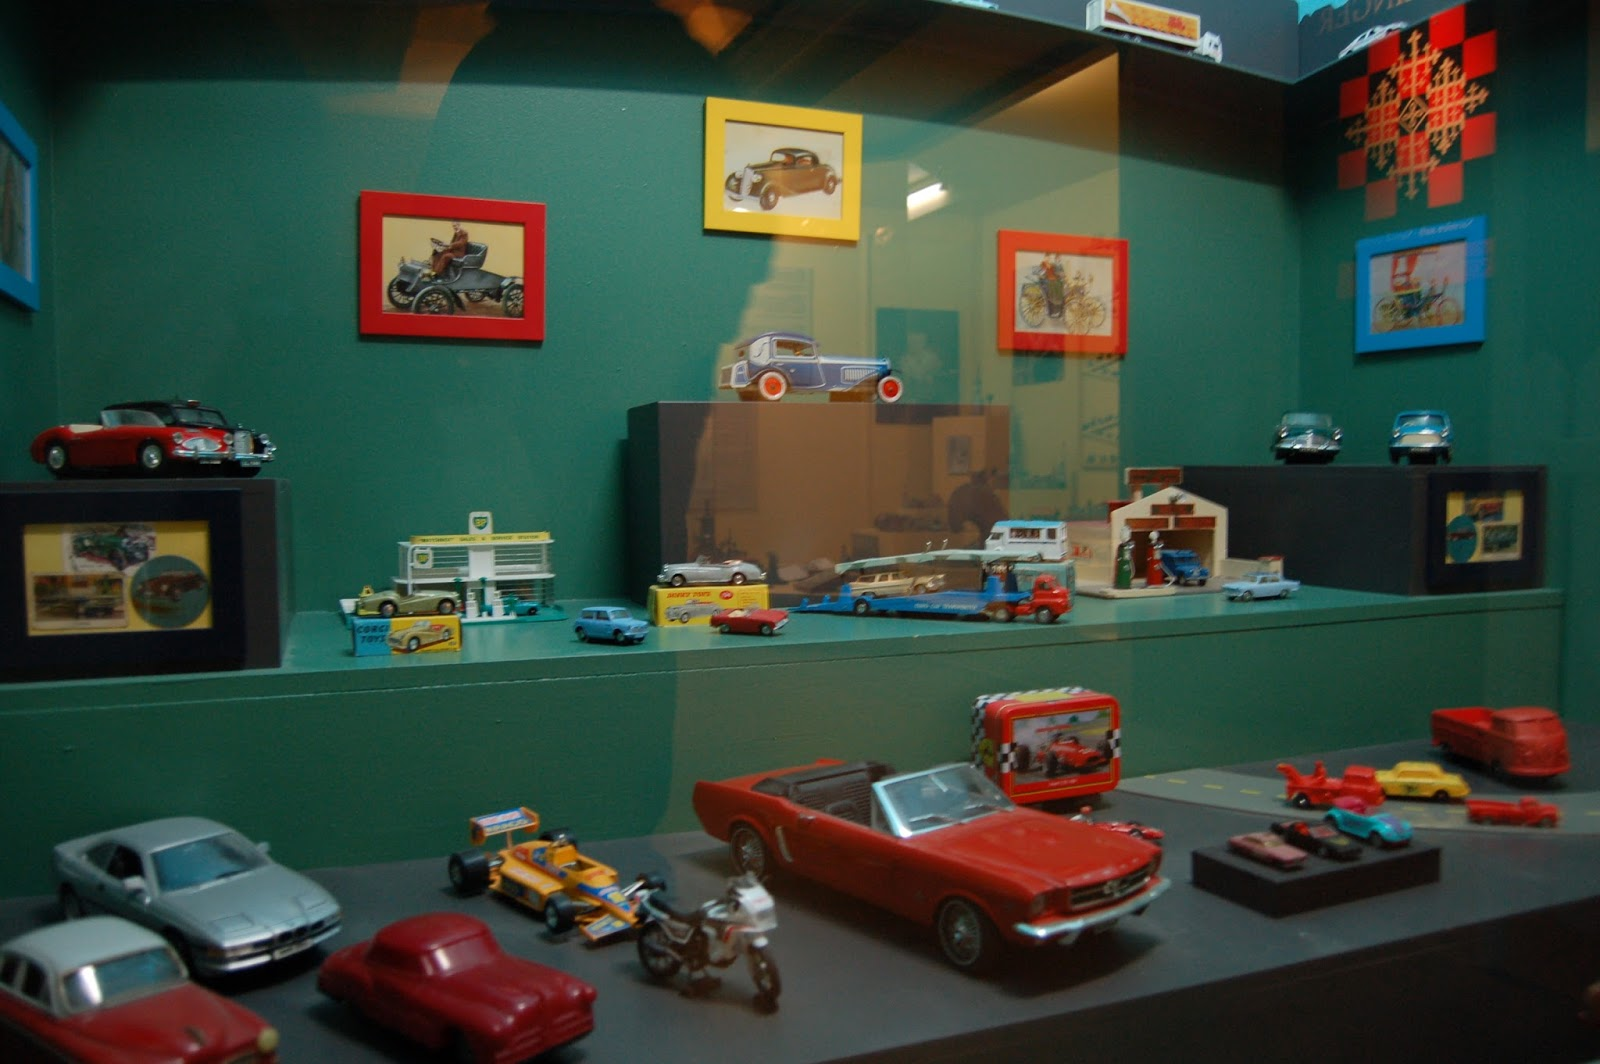 zabawki norweskie, design, skansen w Oslo, Norwegia